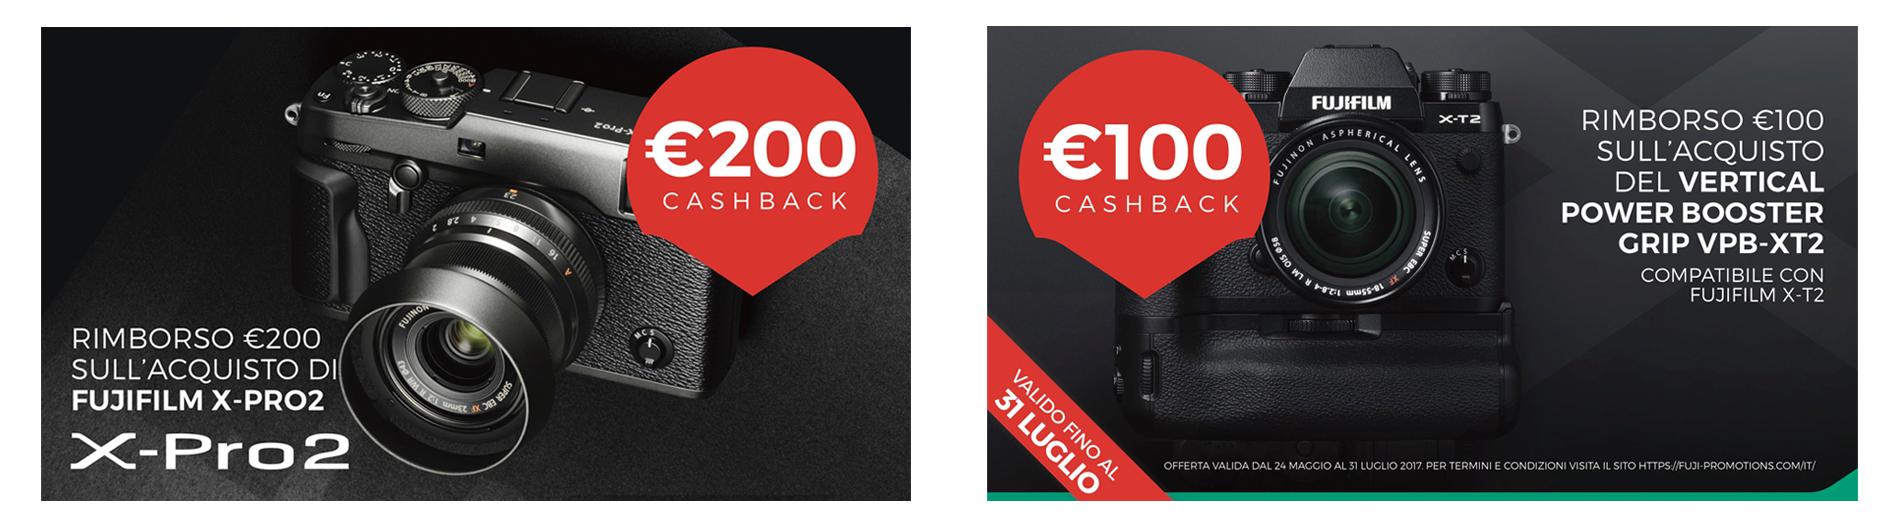 Cashback Fujifilm su Xpro2 e impugnatura Xt2